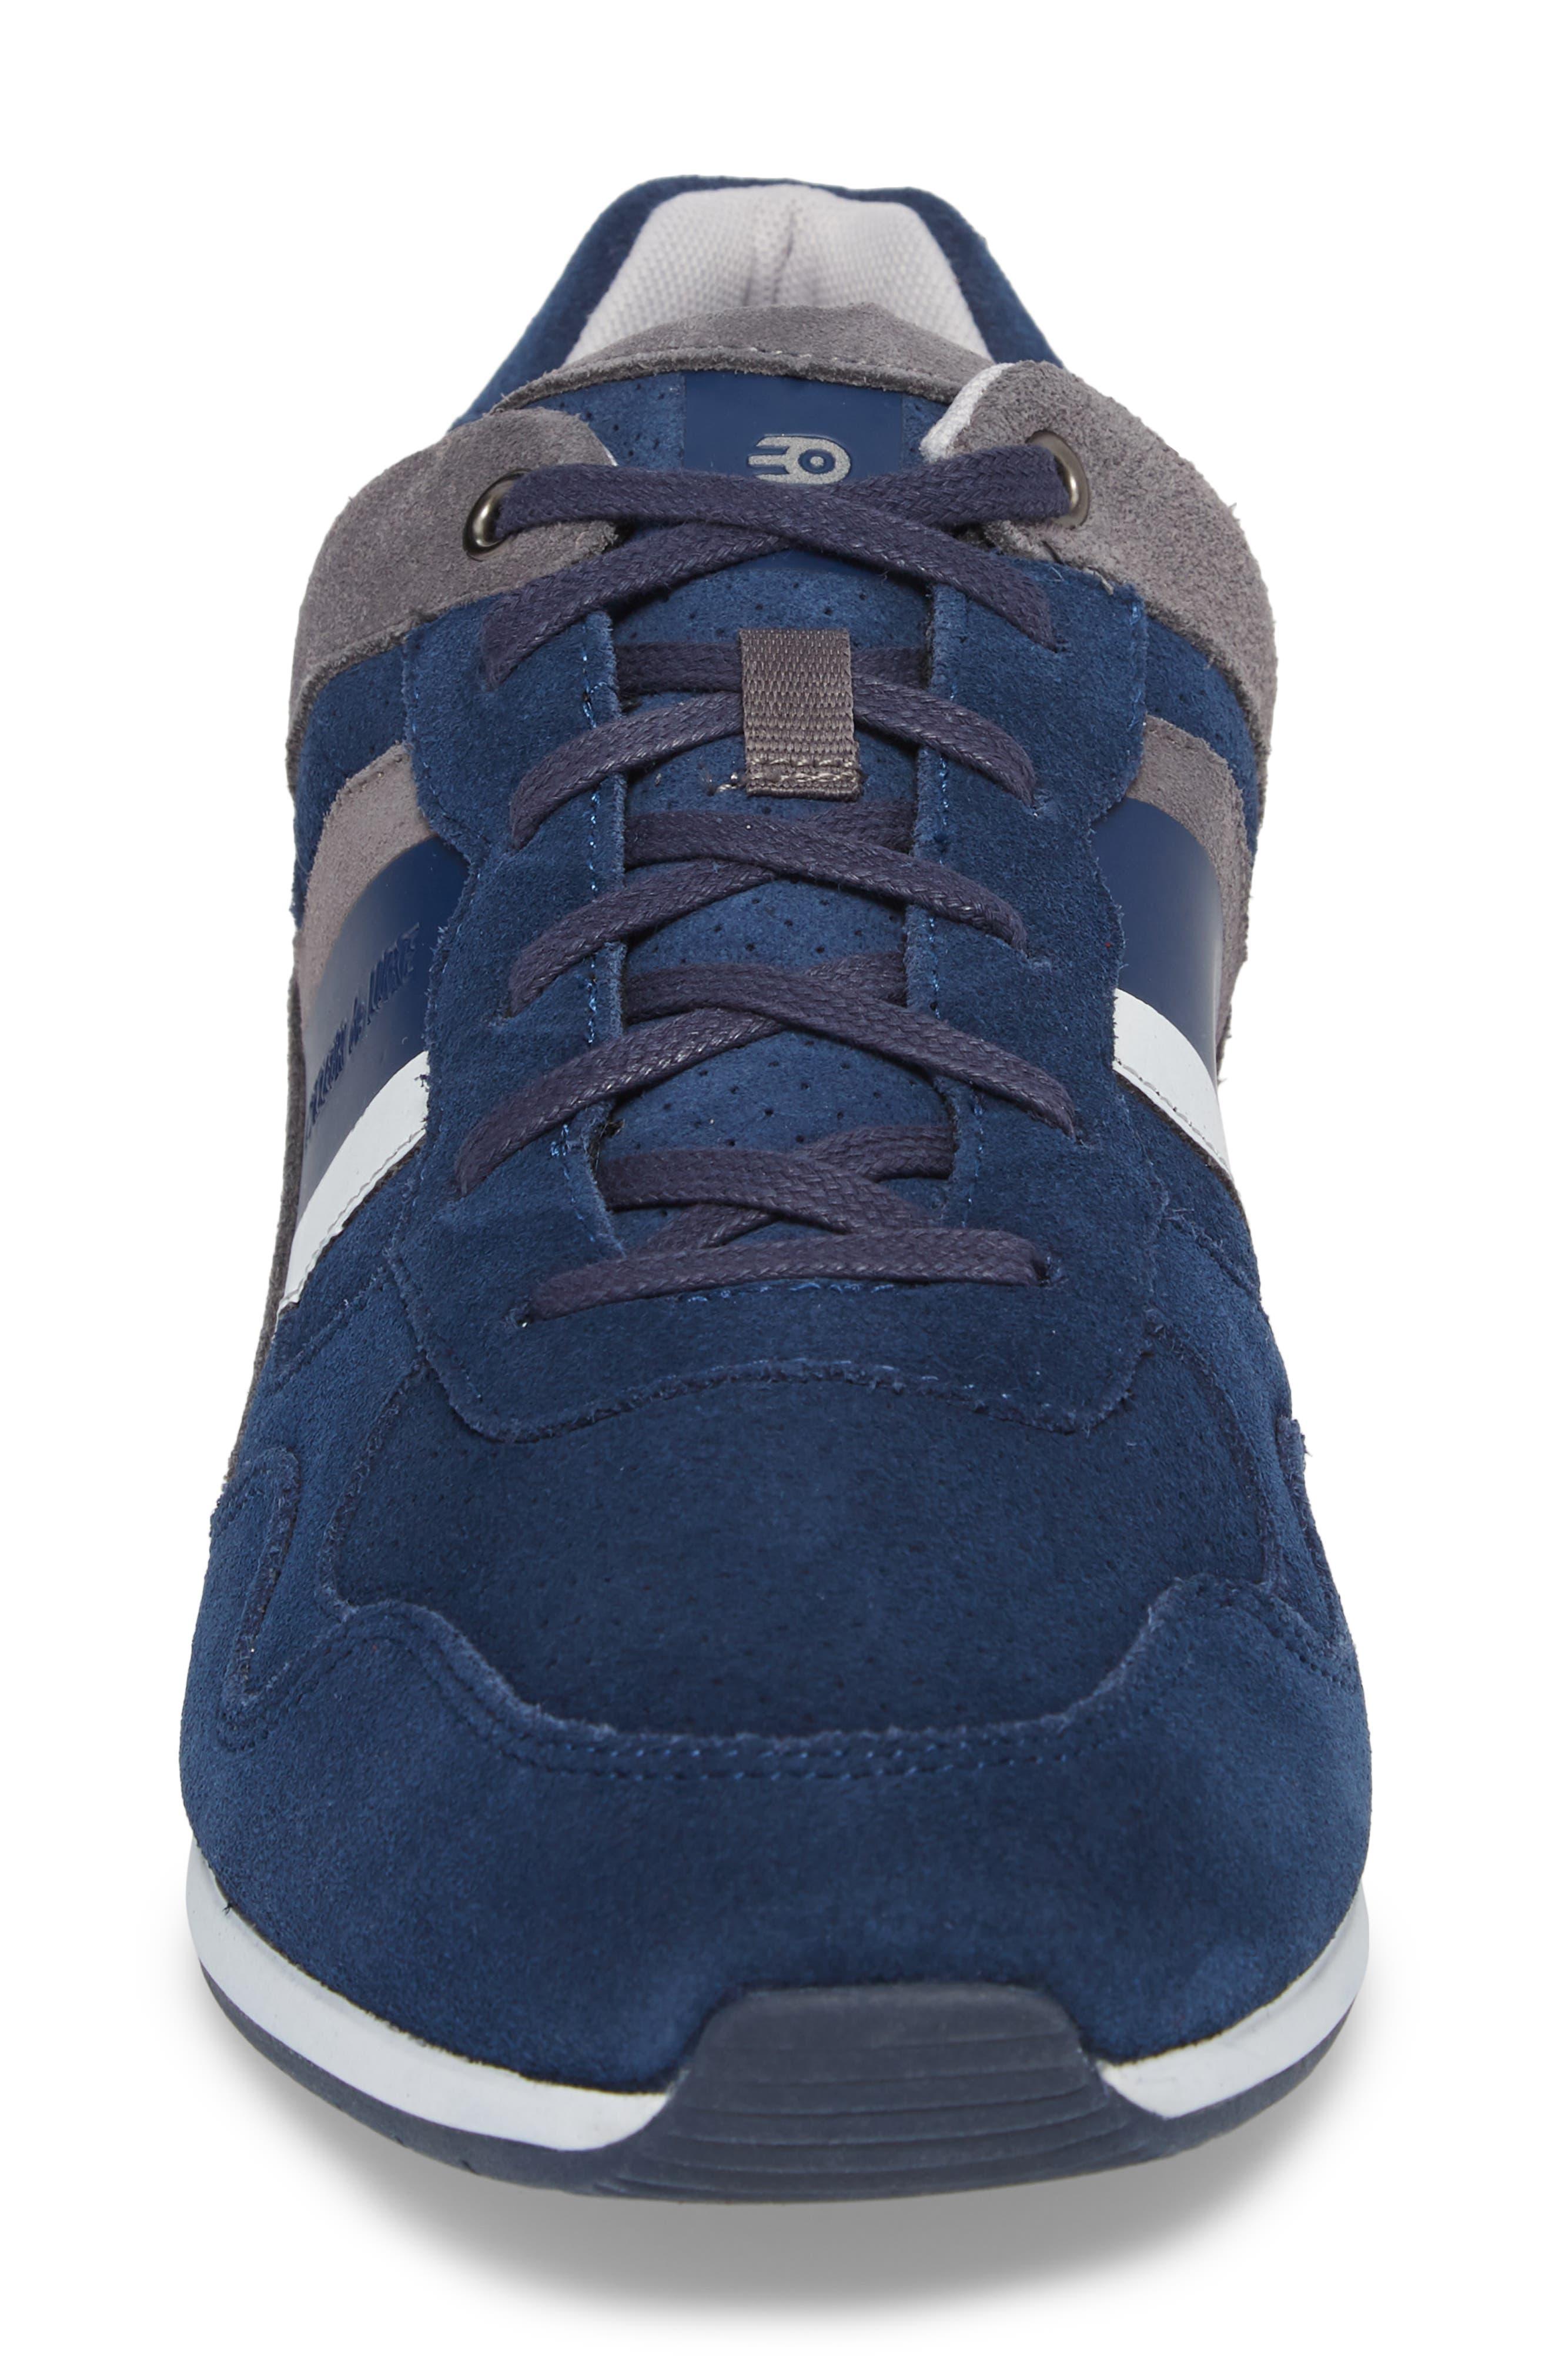 Scarpo Low Top Sneaker,                             Alternate thumbnail 4, color,                             Navy Suede